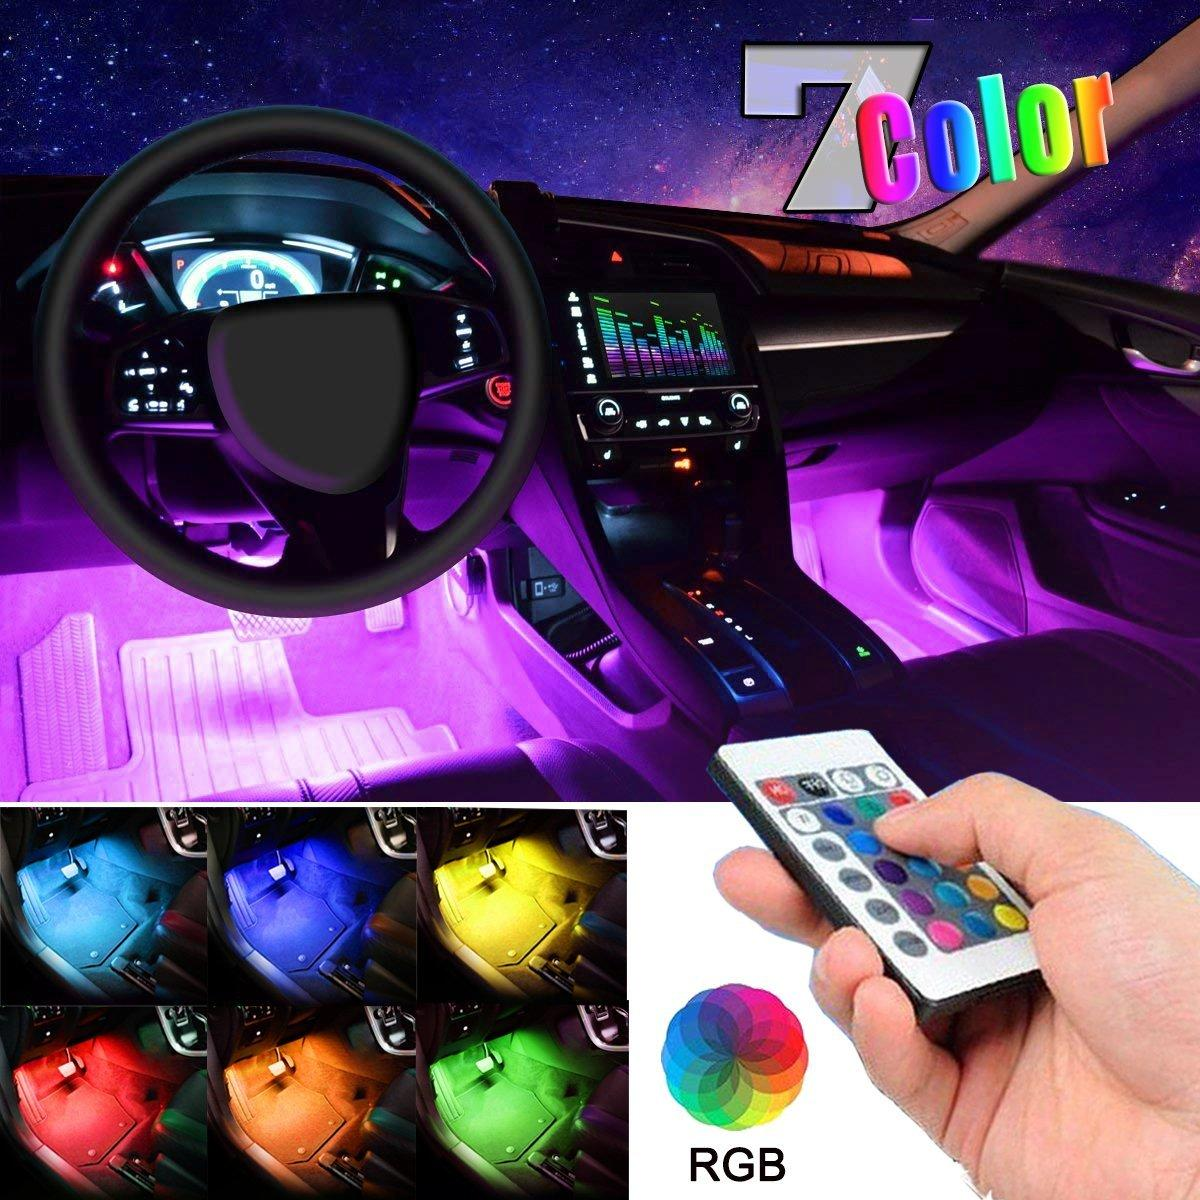 36 LED Multi-Color Auto Inneneinrichtung unter Dash Beleuchtung Wasserdichtes Kit mit drahtloser Fernbedienung Autoladegerät Auto DVR QC16